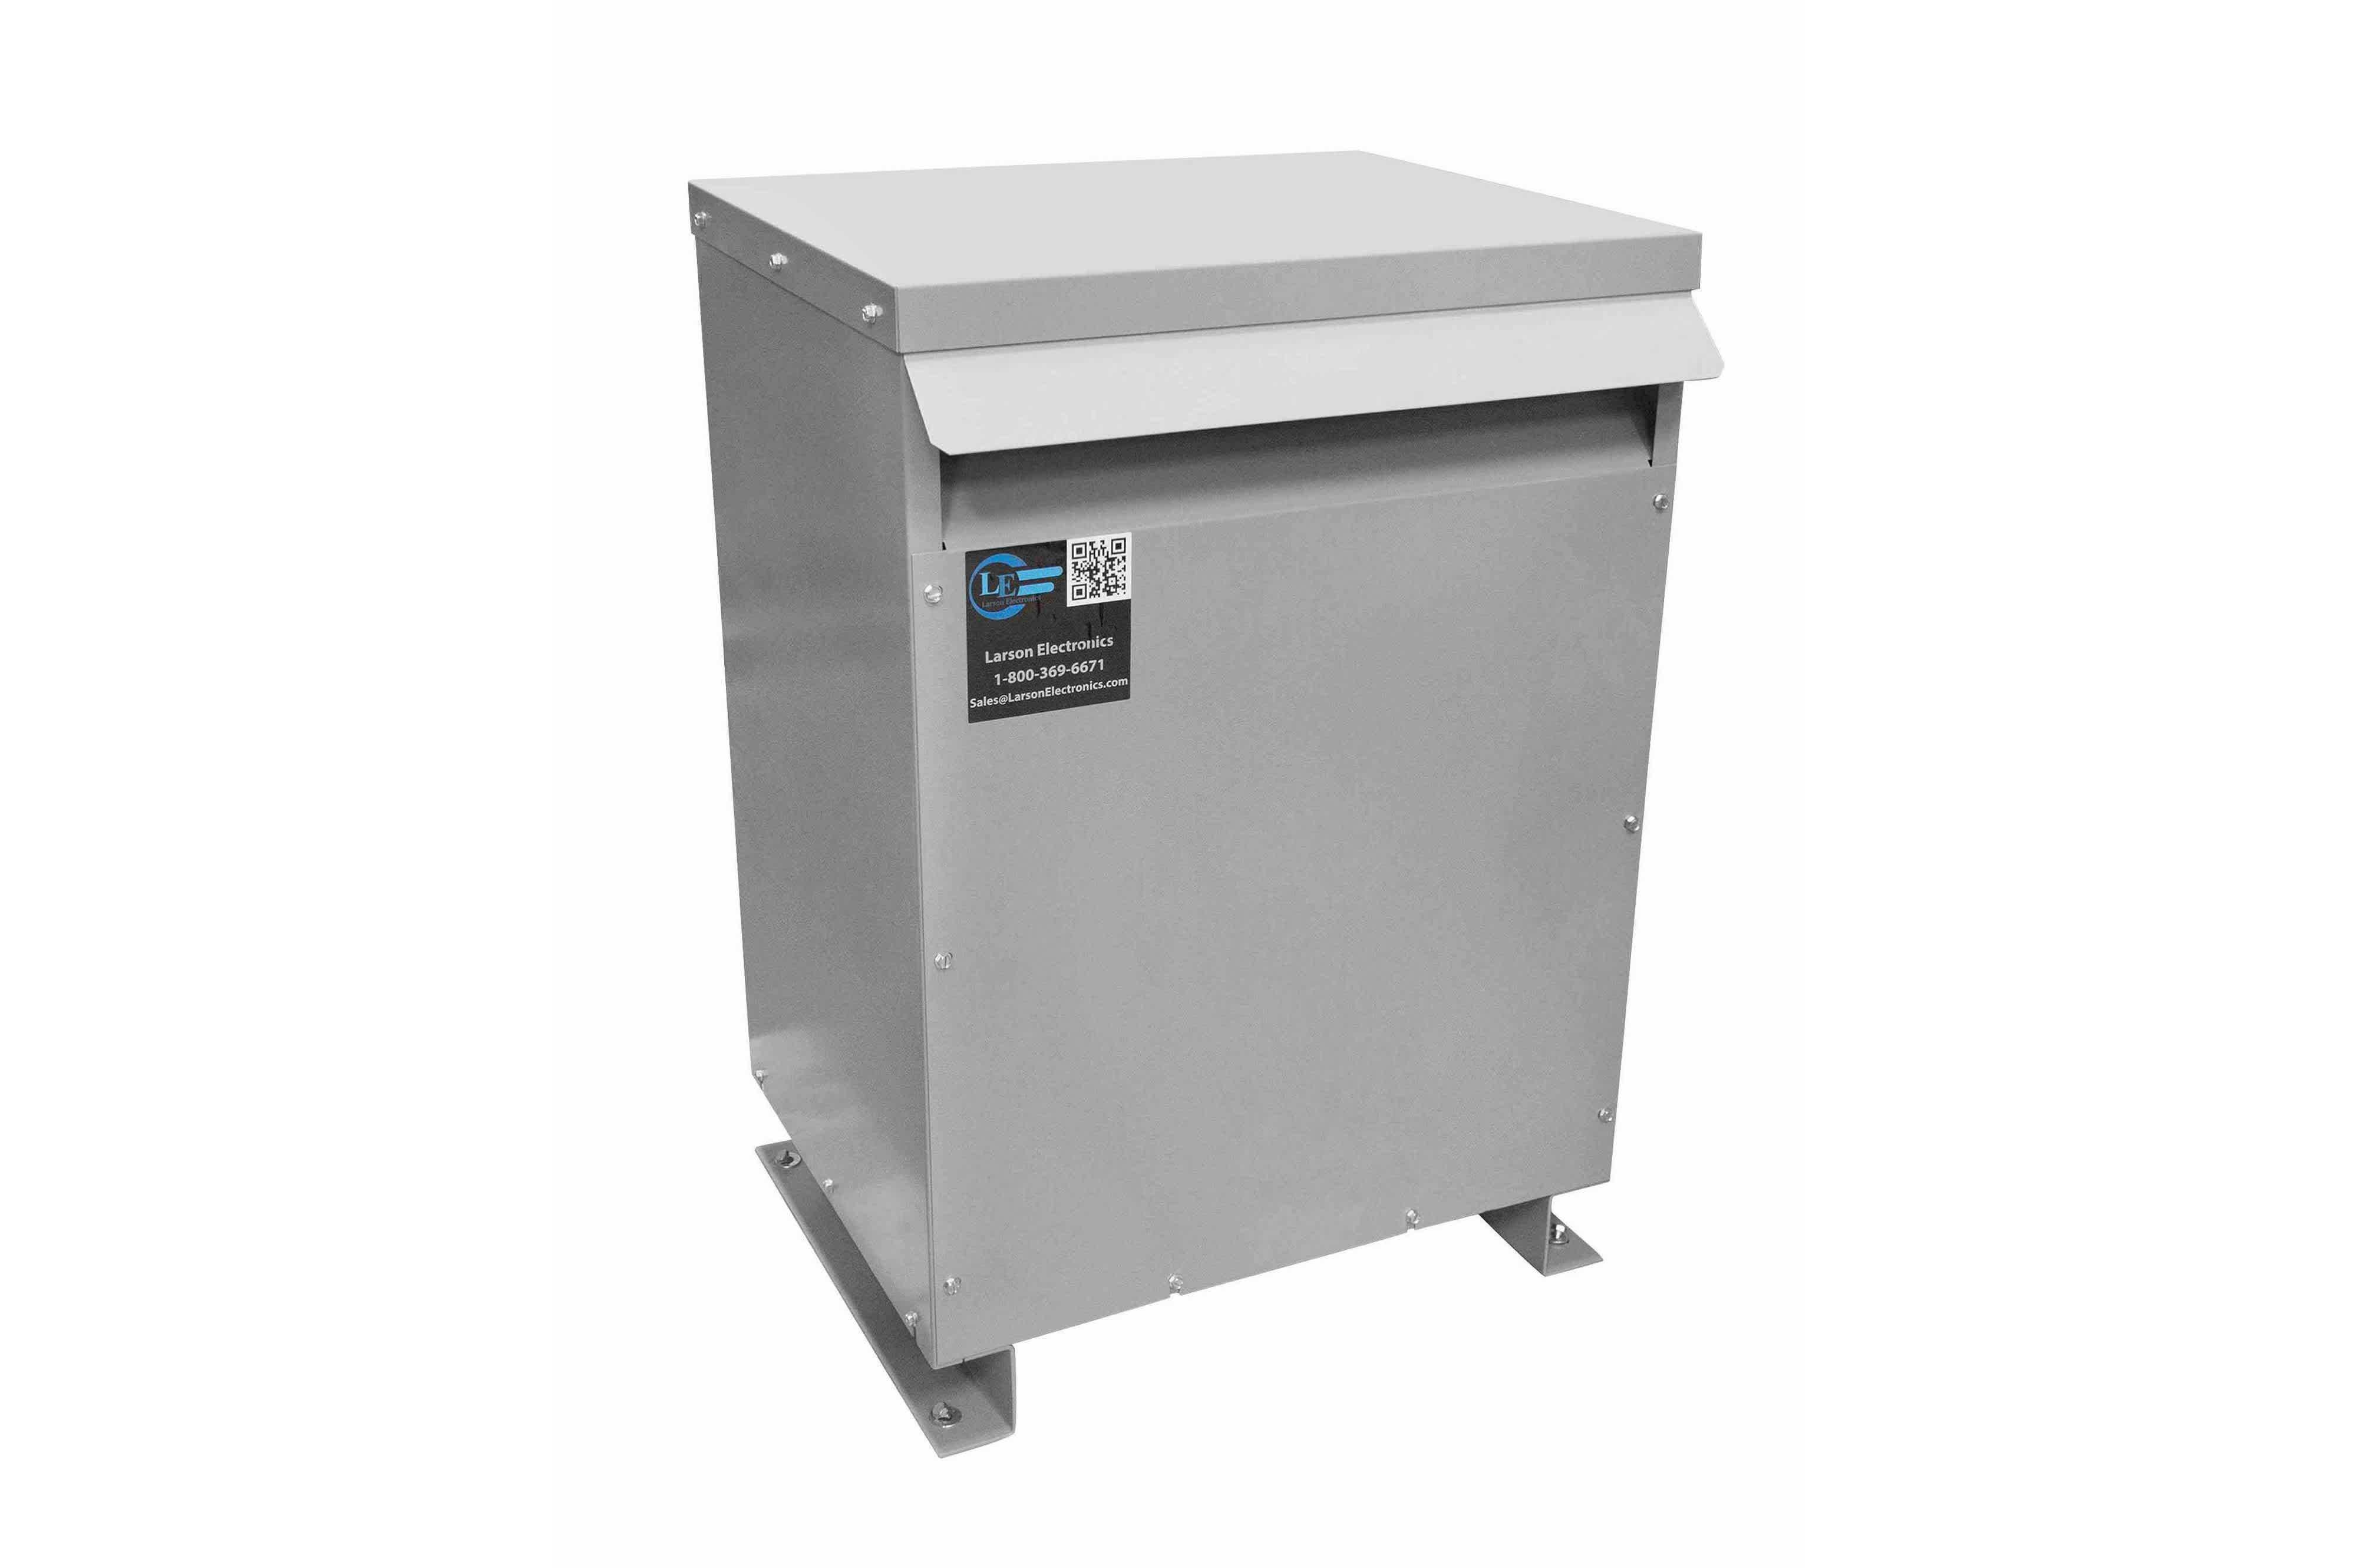 225 kVA 3PH Isolation Transformer, 208V Wye Primary, 415Y/240 Wye-N Secondary, N3R, Ventilated, 60 Hz